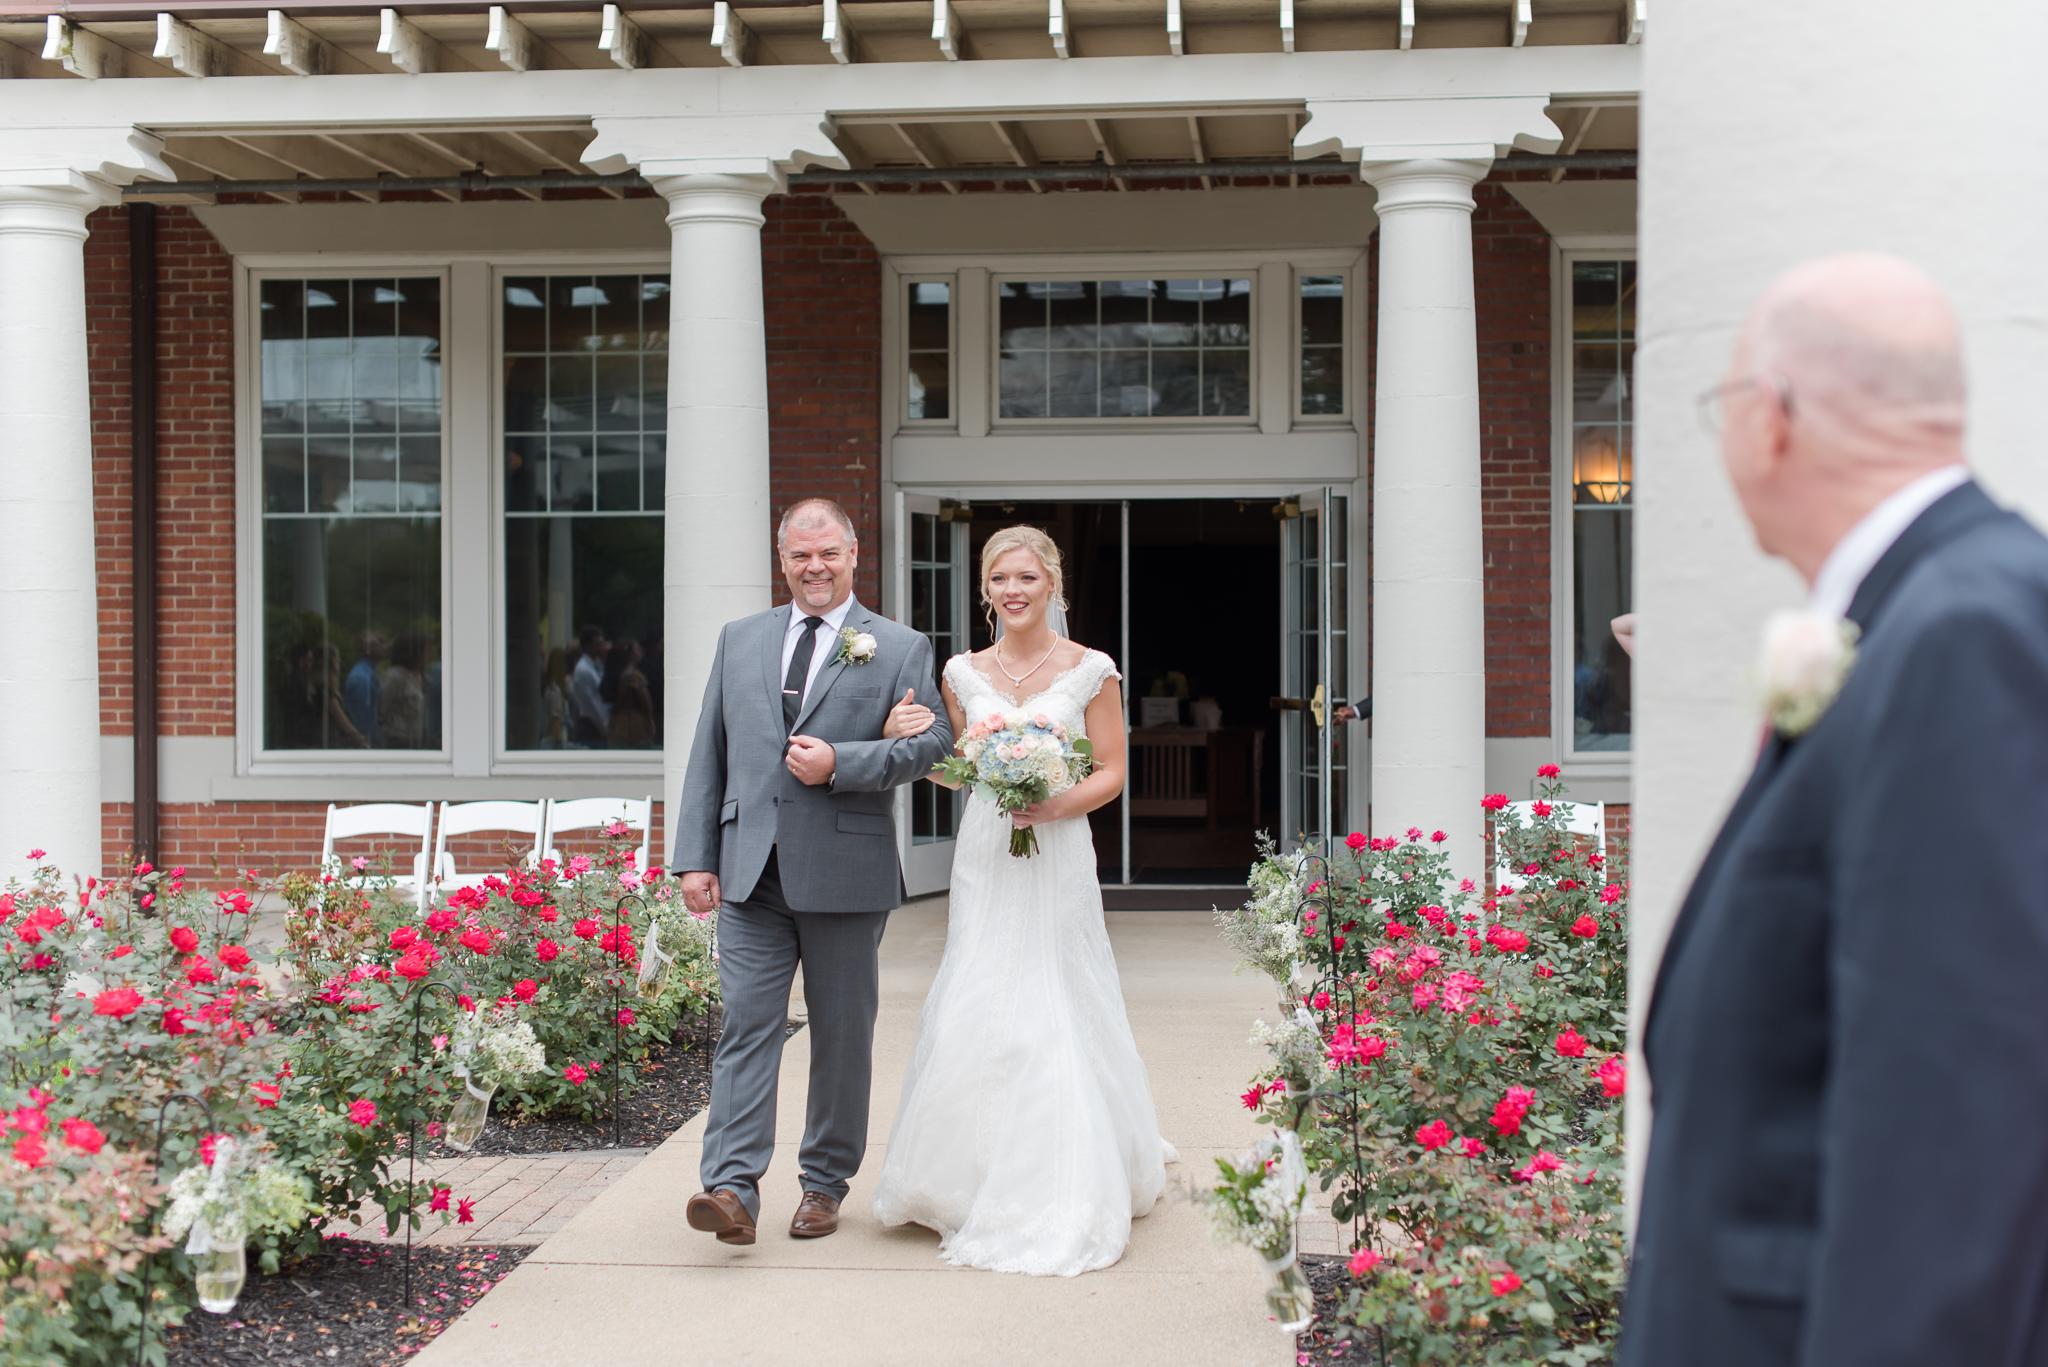 Westminister Hall Wedding Winona Lake Indiana9533.jpg